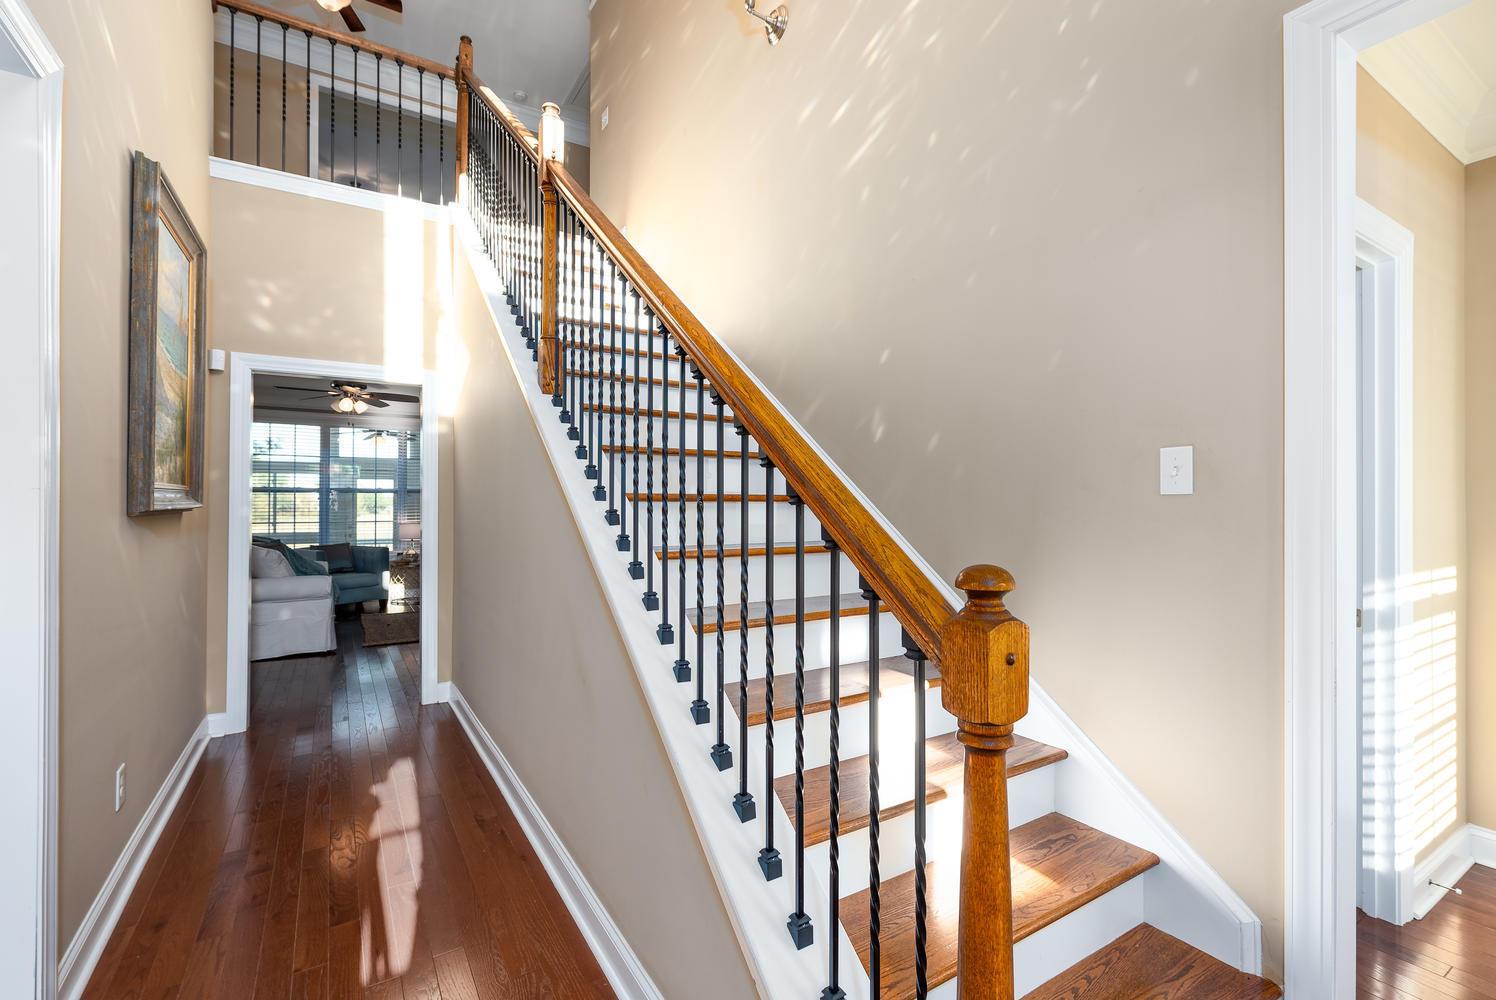 River Reach Pointe Homes For Sale - 1216 Rivers Reach Drive, Charleston, SC - 37